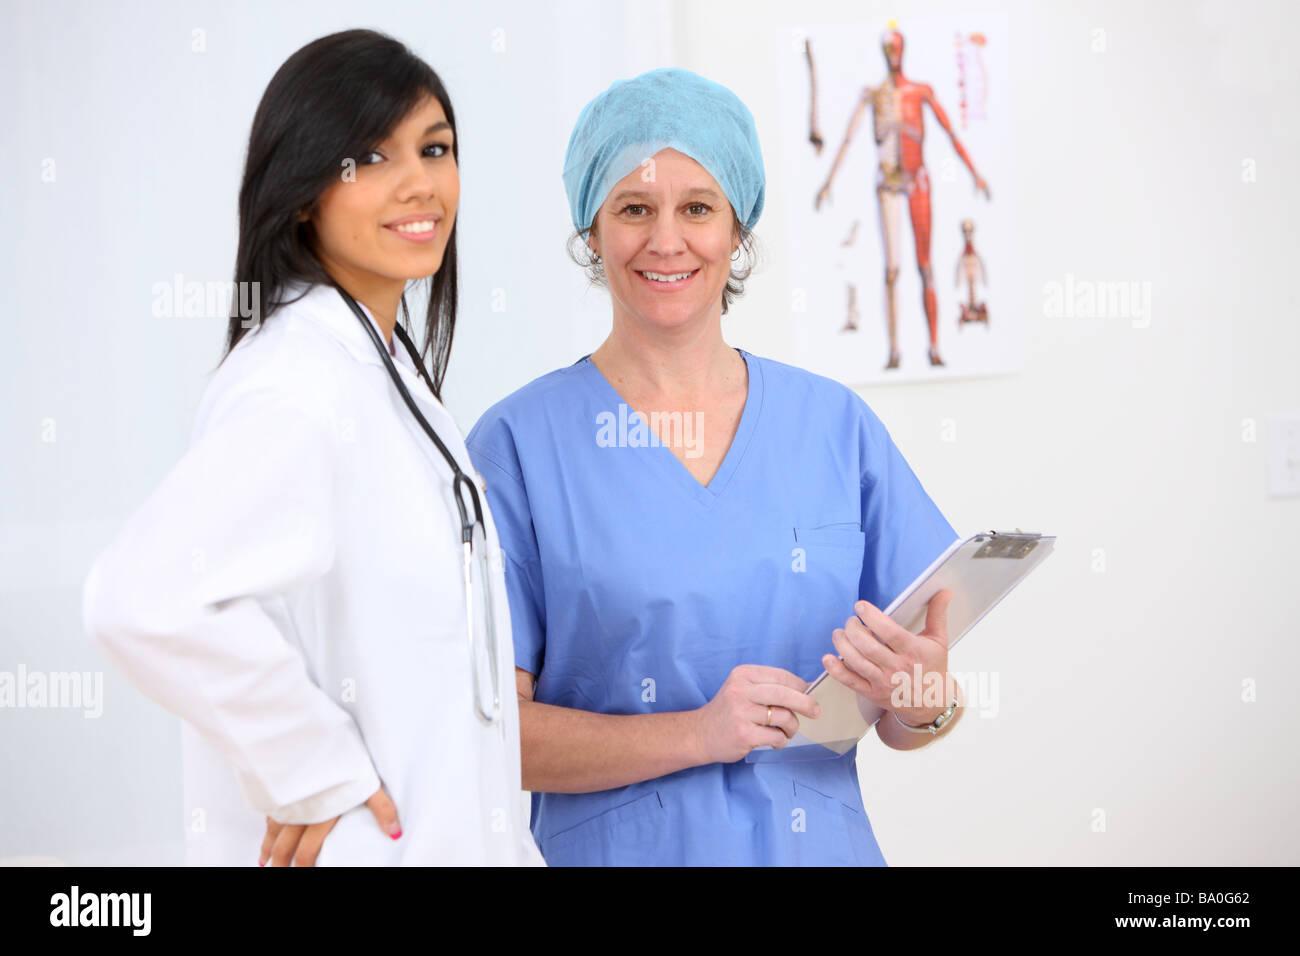 Medical personnel portrait - Stock Image